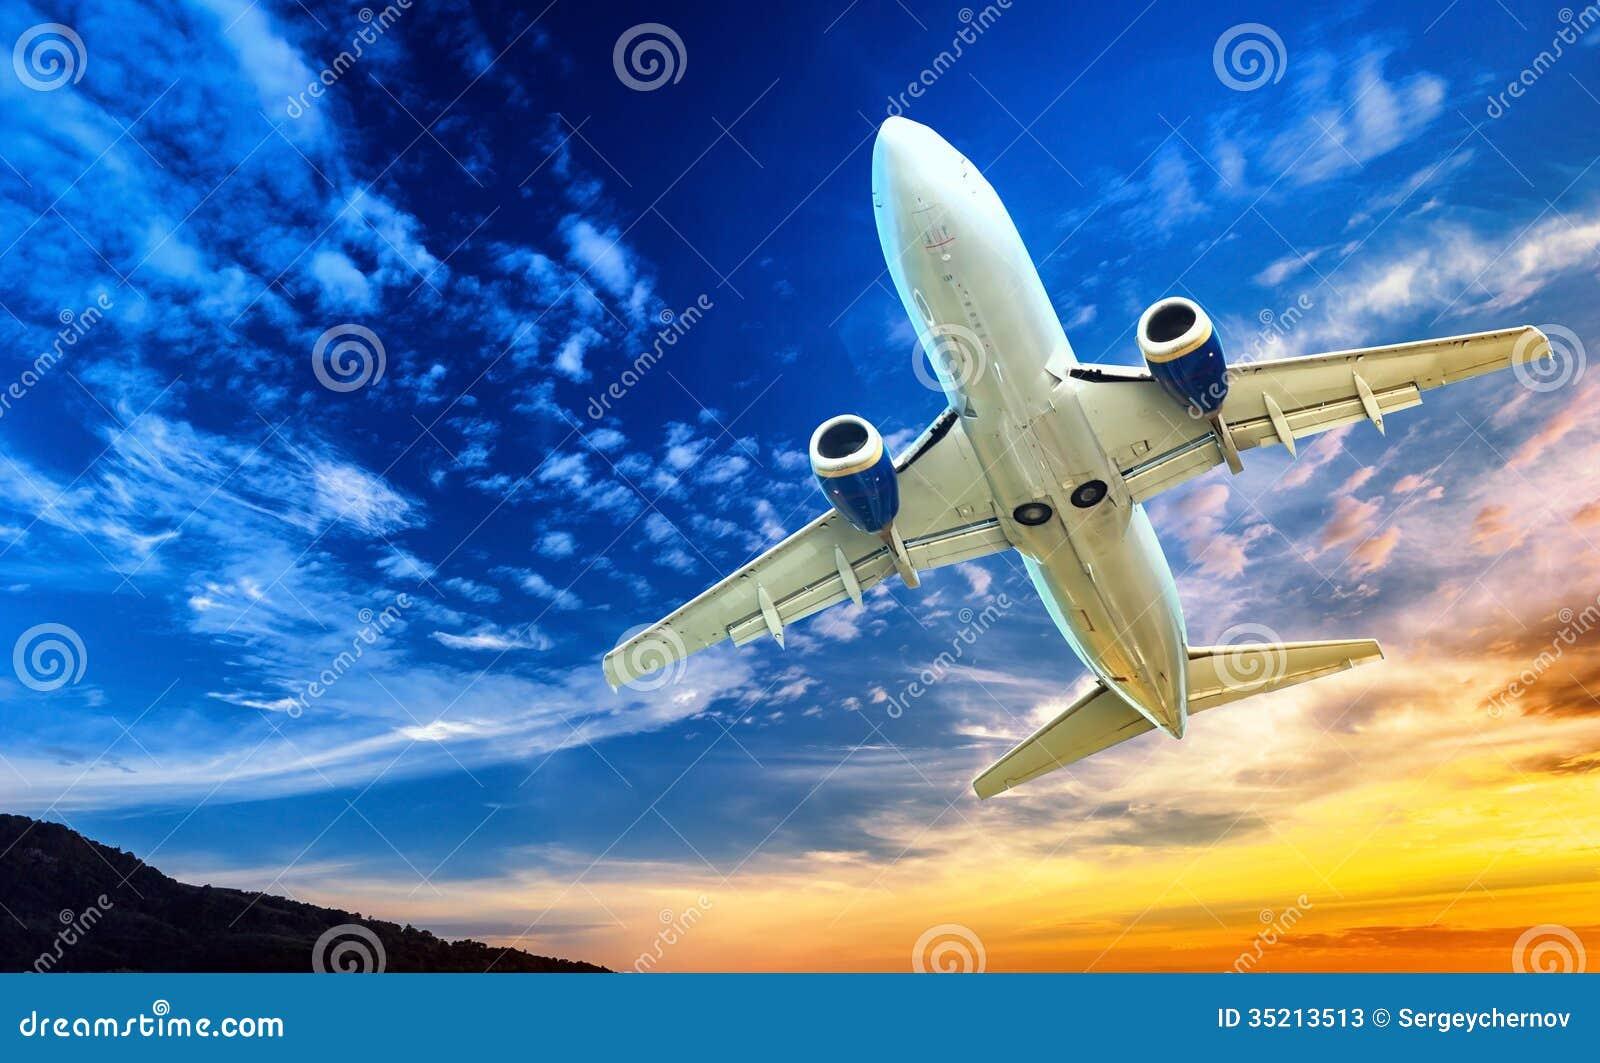 Airplane transportation. Jet air plane